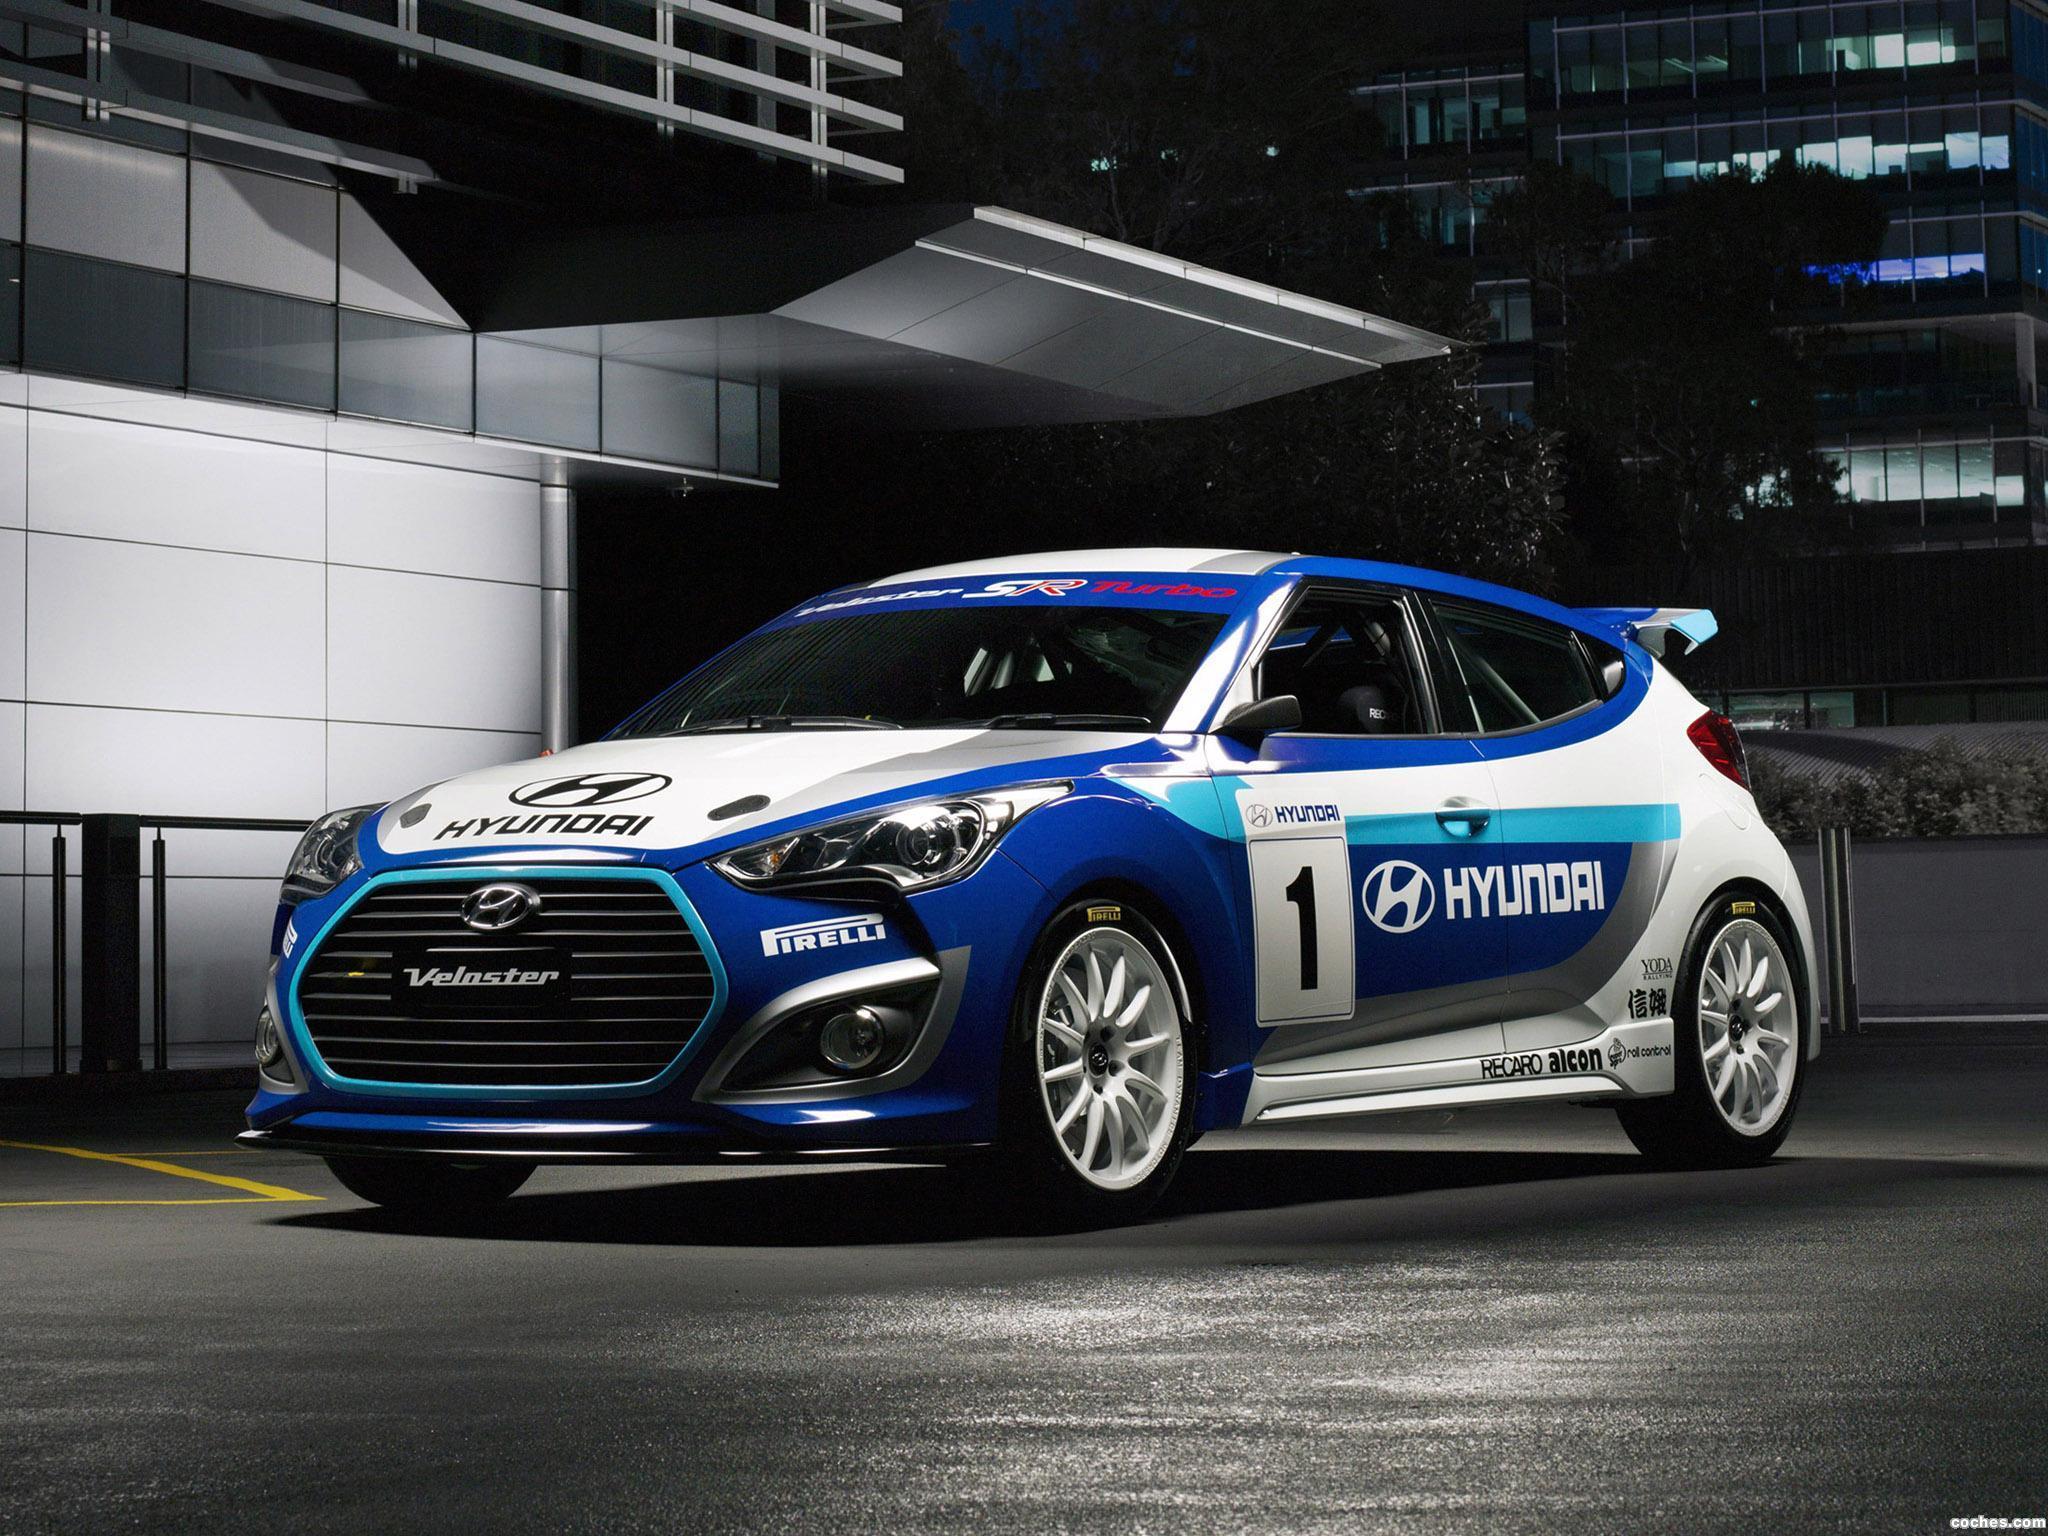 Foto 0 de Hyundai Veloster Race Concept 2012